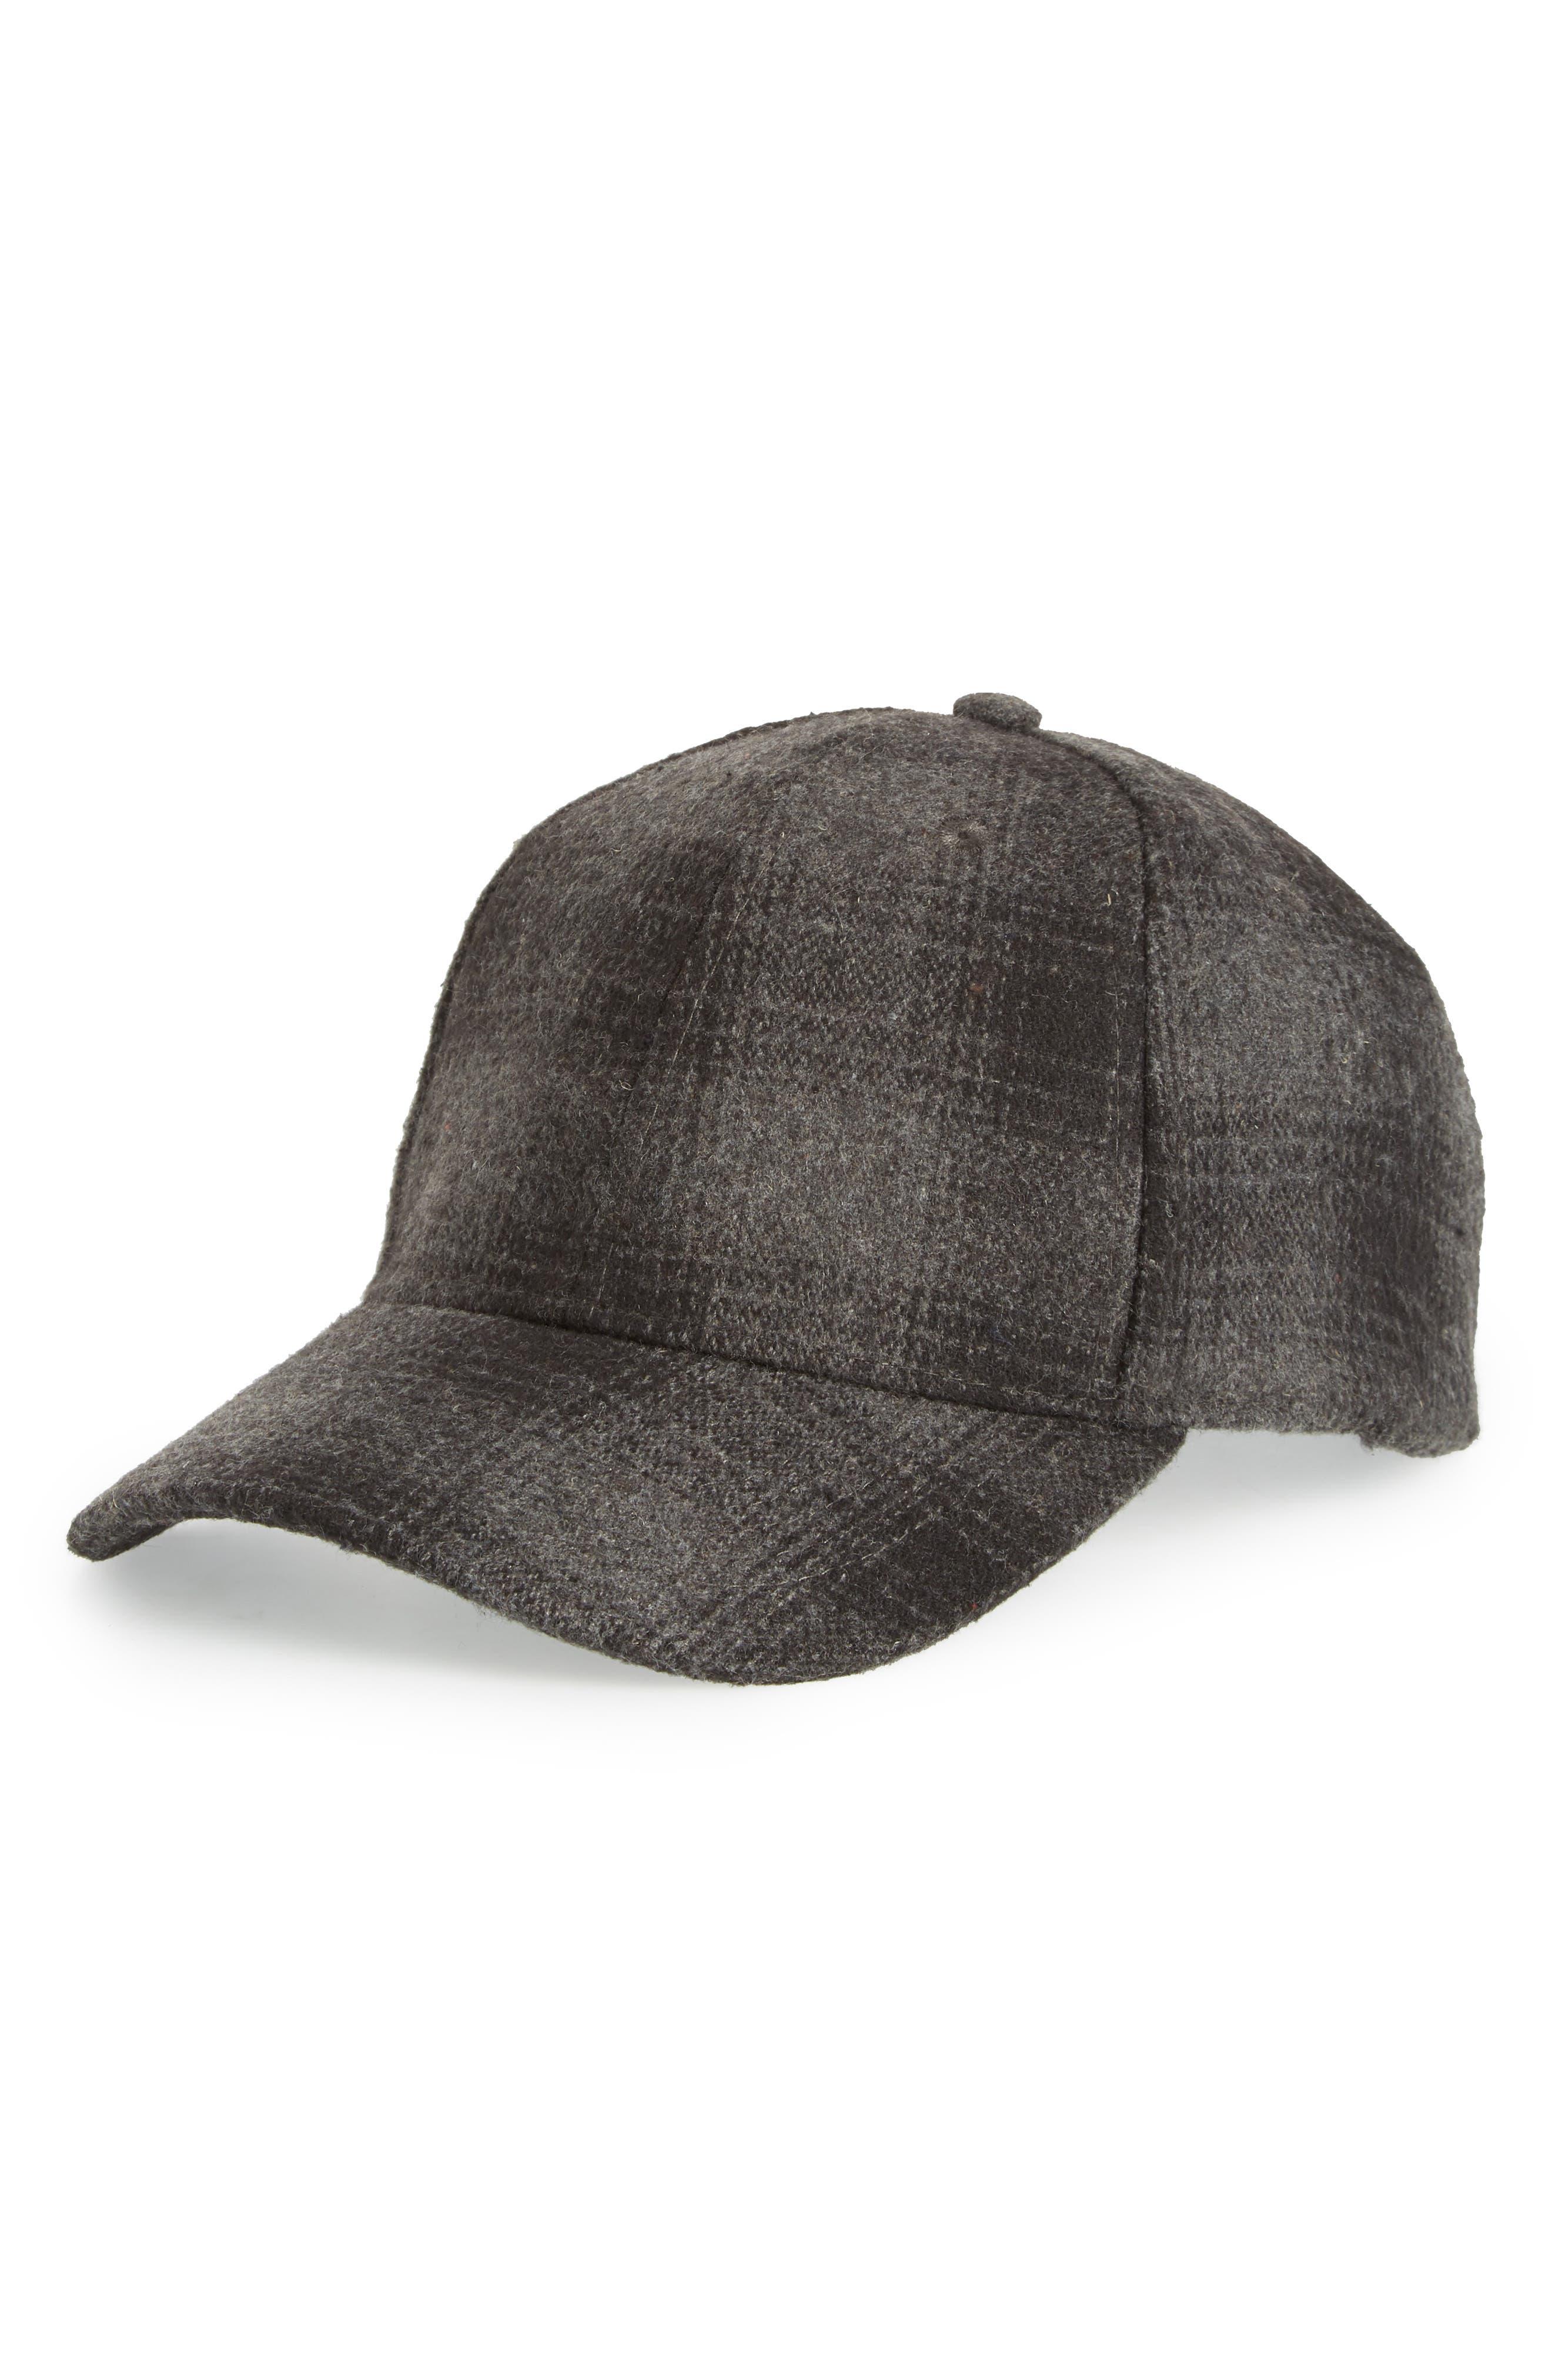 Buffalo Check Baseball Cap,                         Main,                         color, GREY ASPHALT